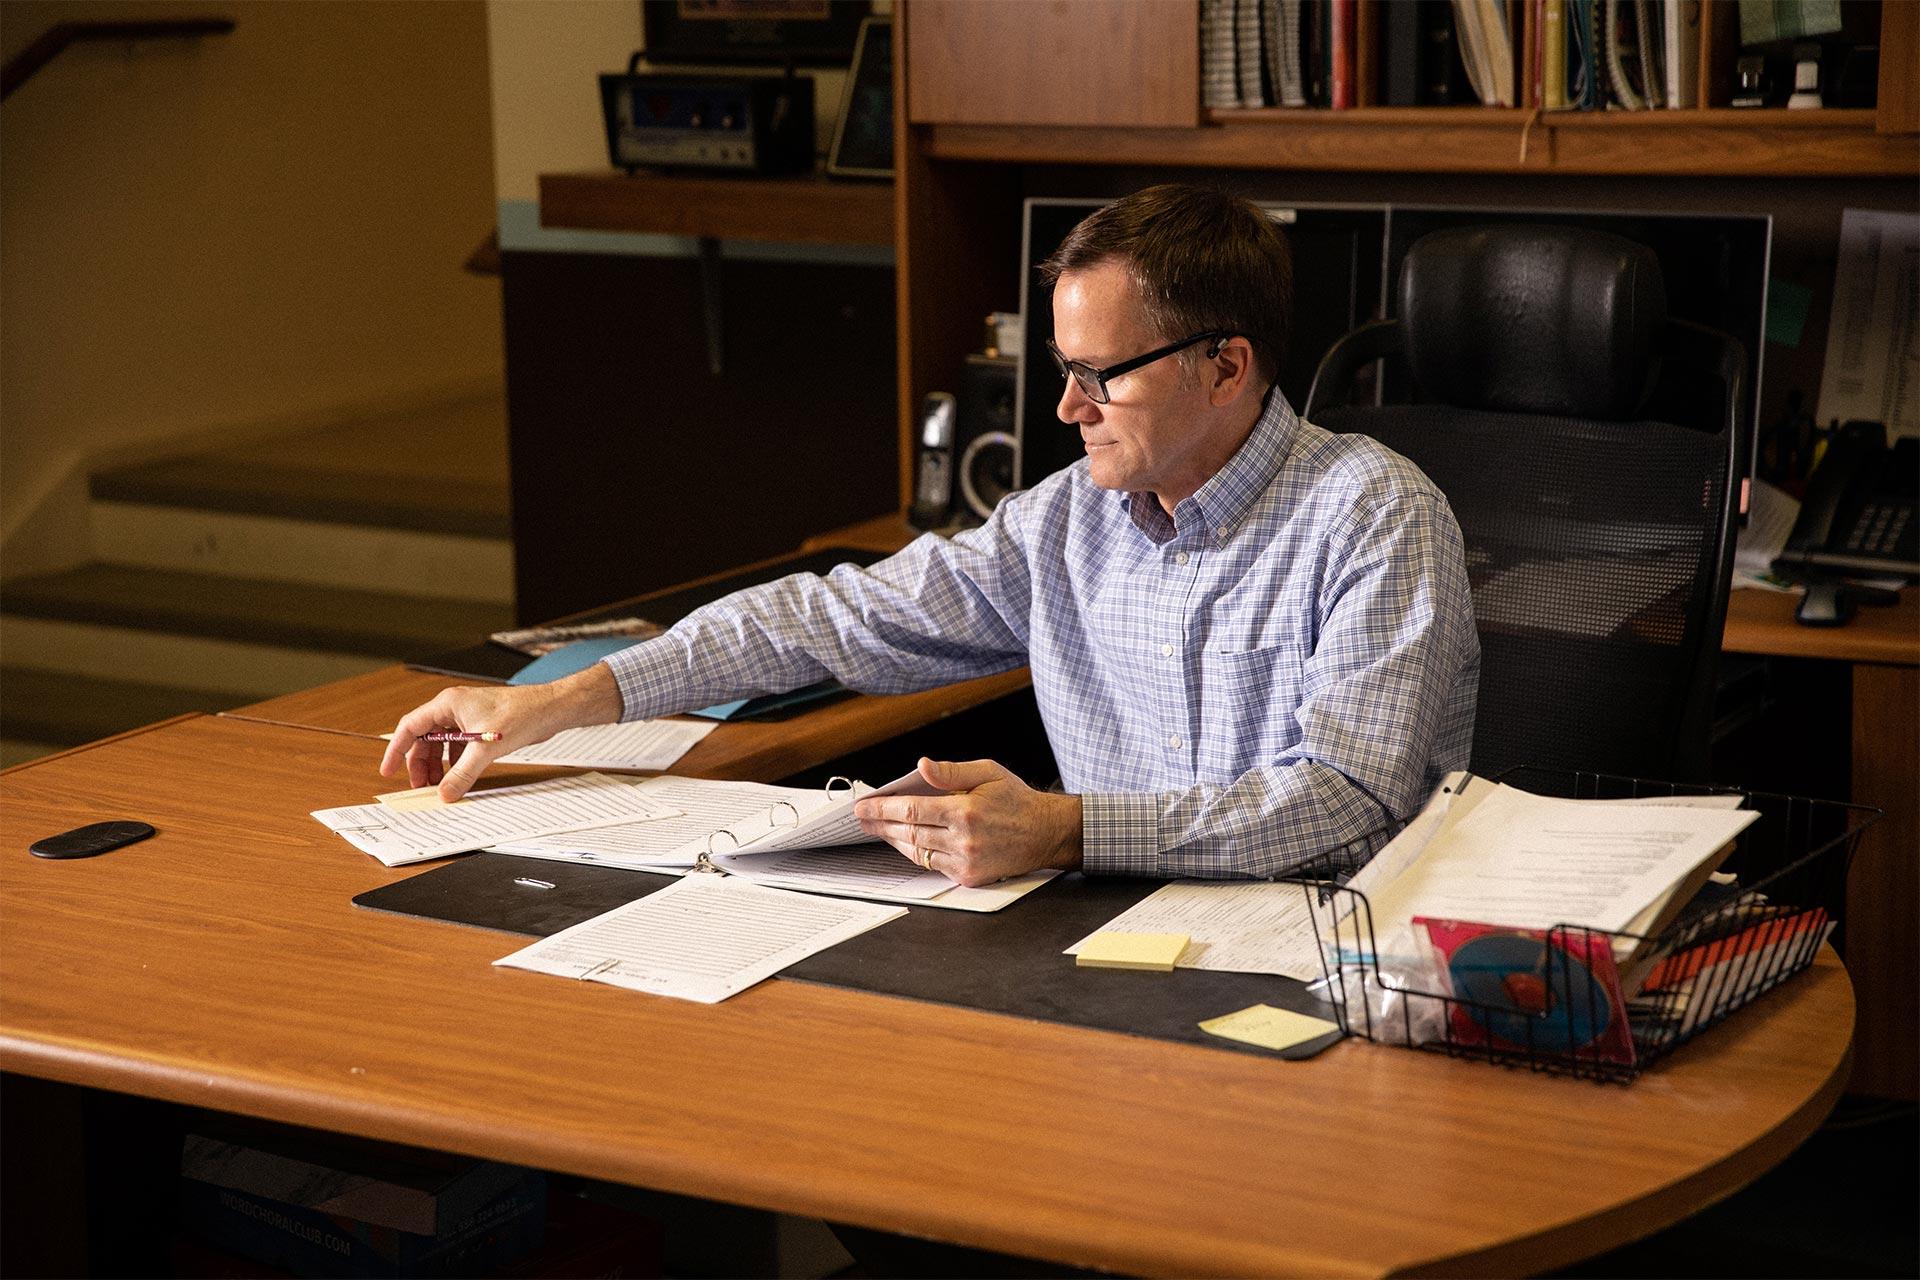 Bill Crawford sitting at a desk, examining paperwork